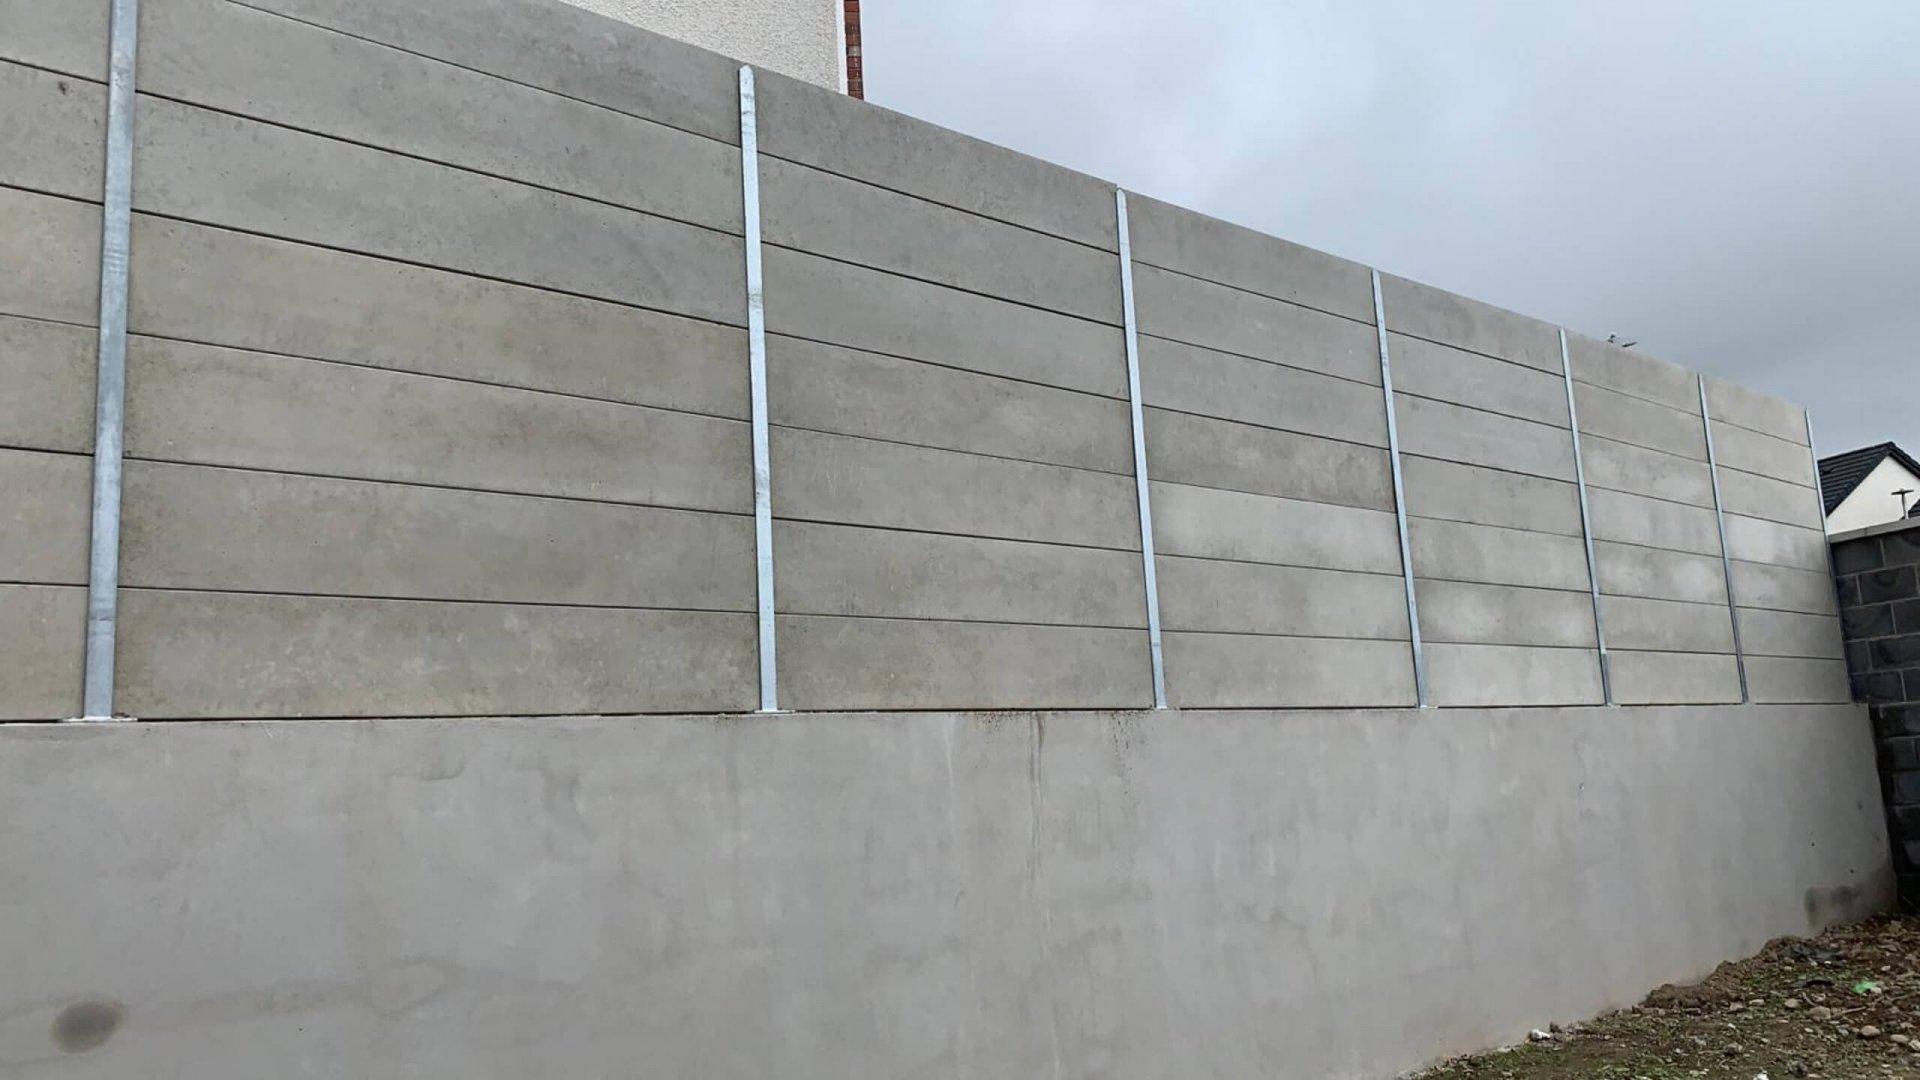 Concrete Panel with Galvanised Steel Post